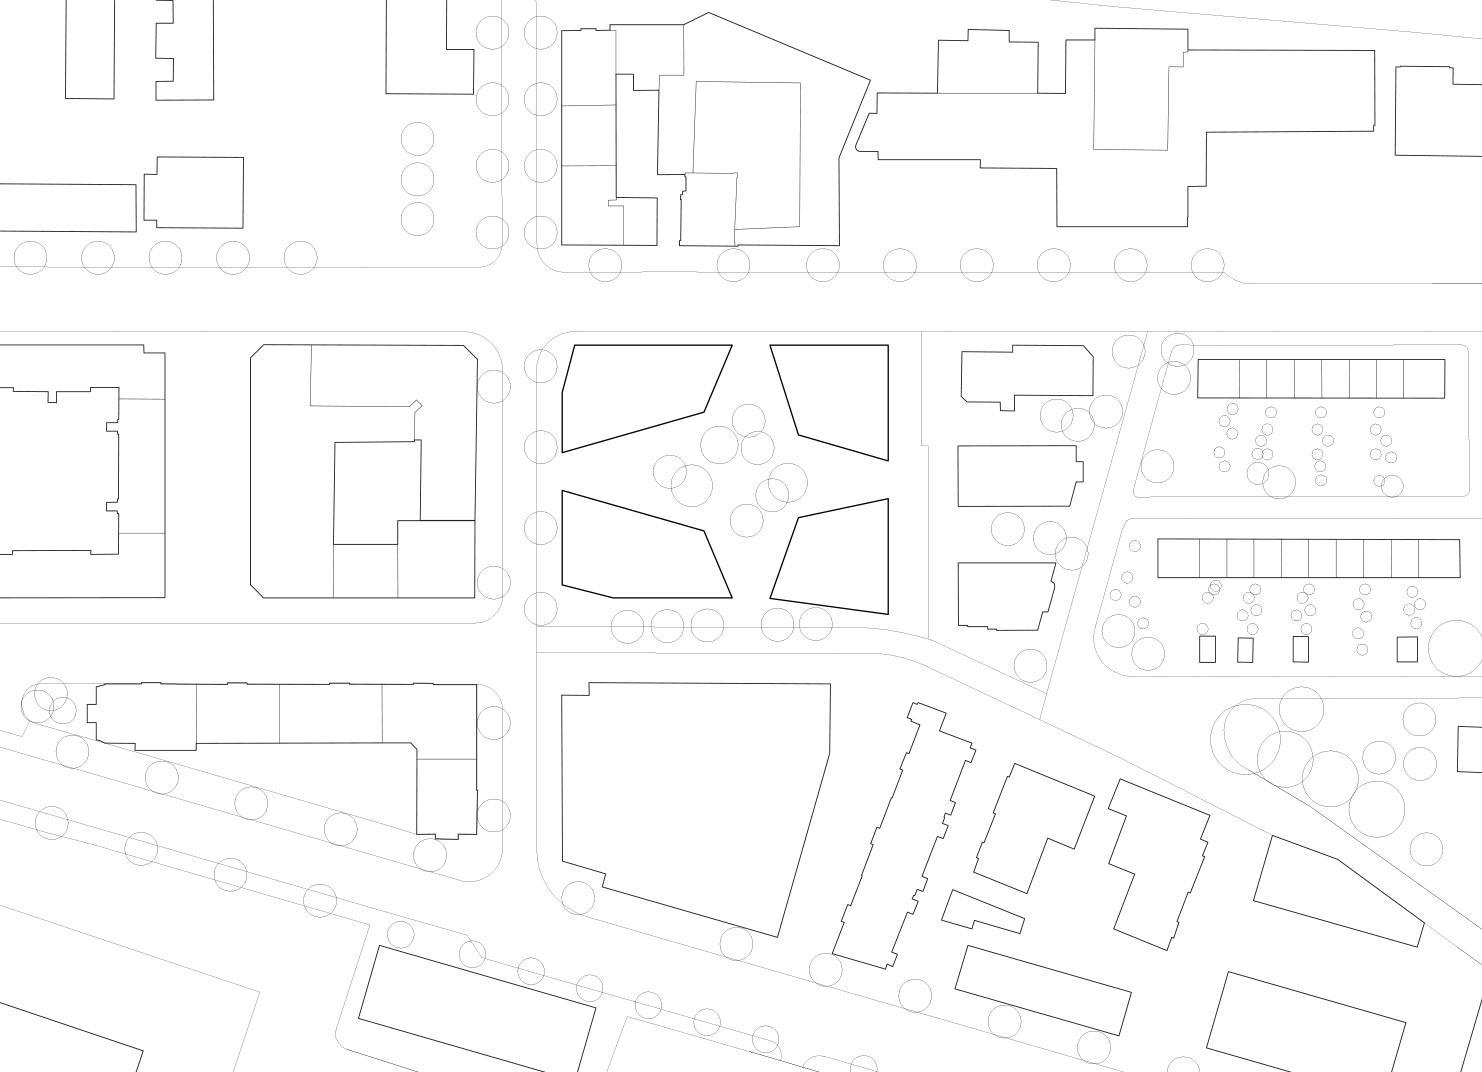 Fruehauf Henry & Viladoms · Avenue de Morges · Divisare